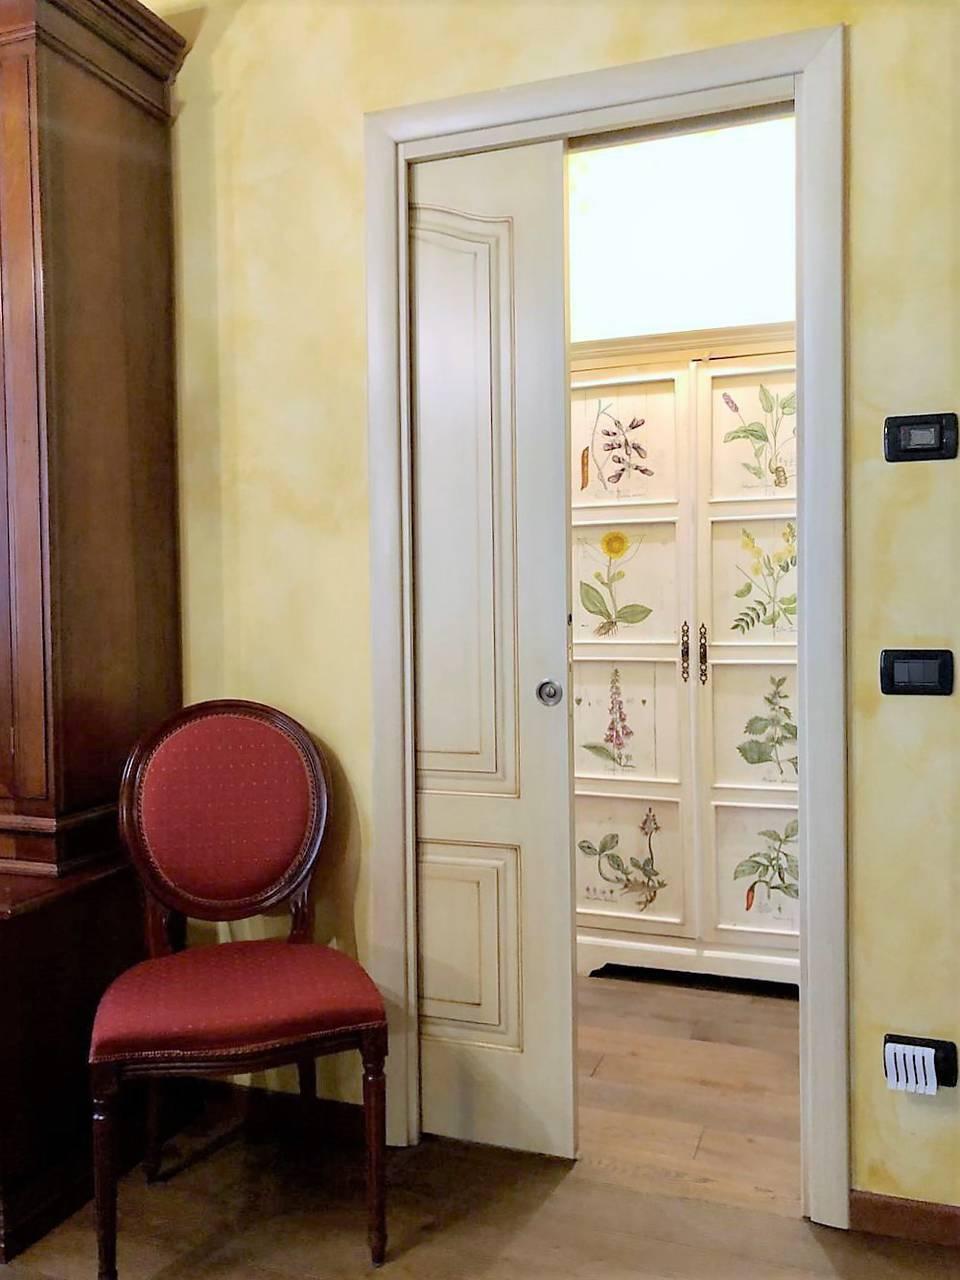 Villa-di-testa-Sulbiate-in-vendita-12